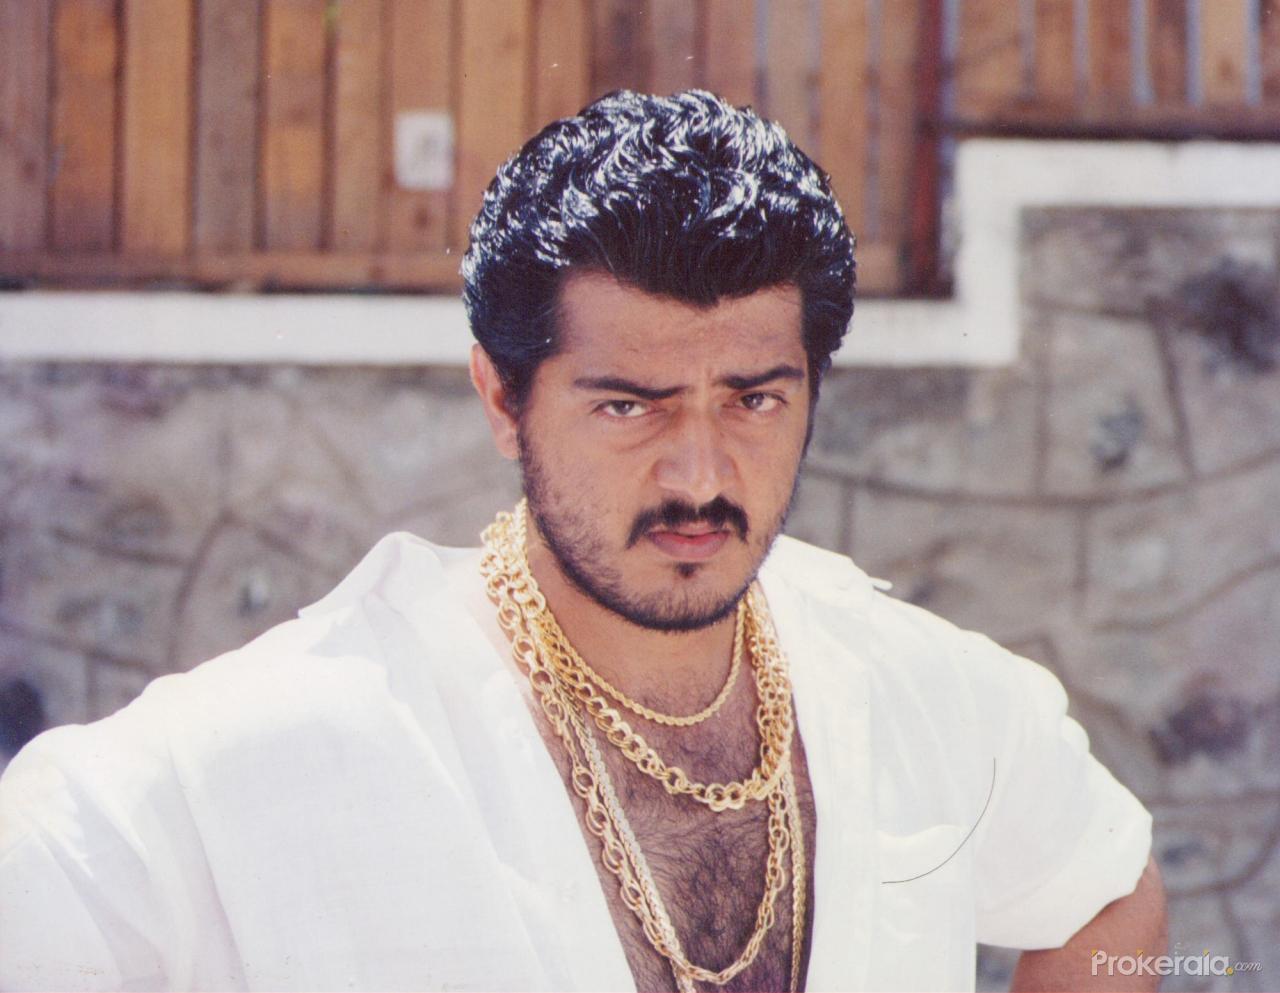 ajith in movie natho pettukoku wallpaper